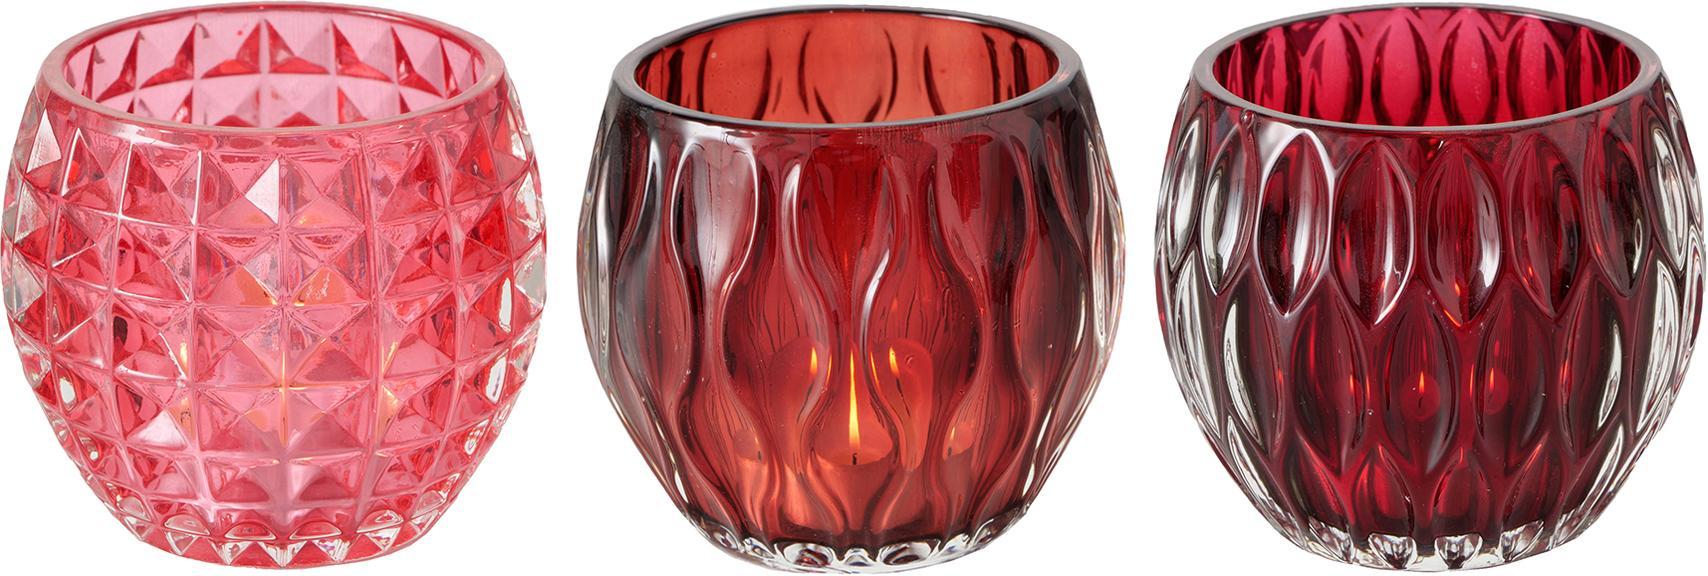 Set 3 portacandele Aliza, Vetro, Rosso, rosa, Ø 10 cm